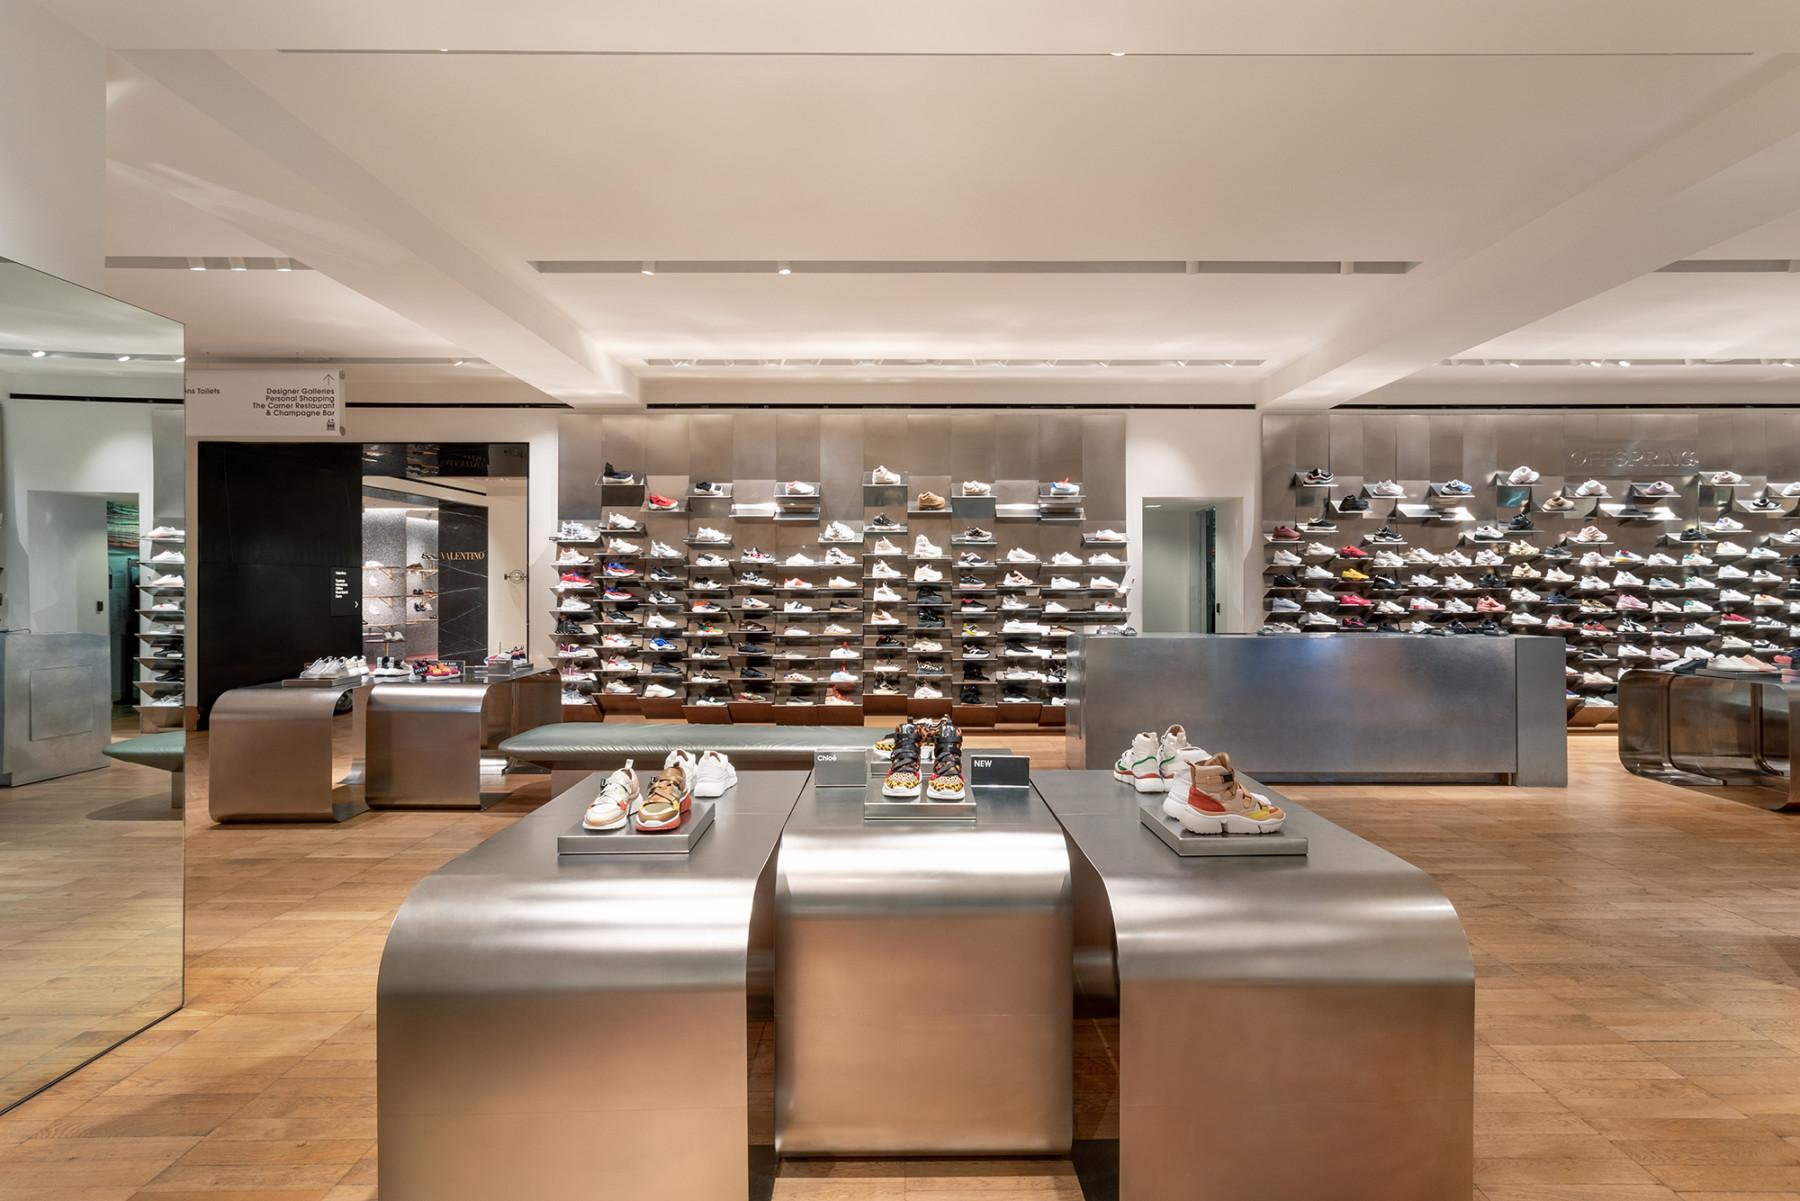 jamie-fobert-architects-selfridges-shoe-galleries-luxury-retail-concept-gallery-design-olivier-hess-photos-sneaker-wall3